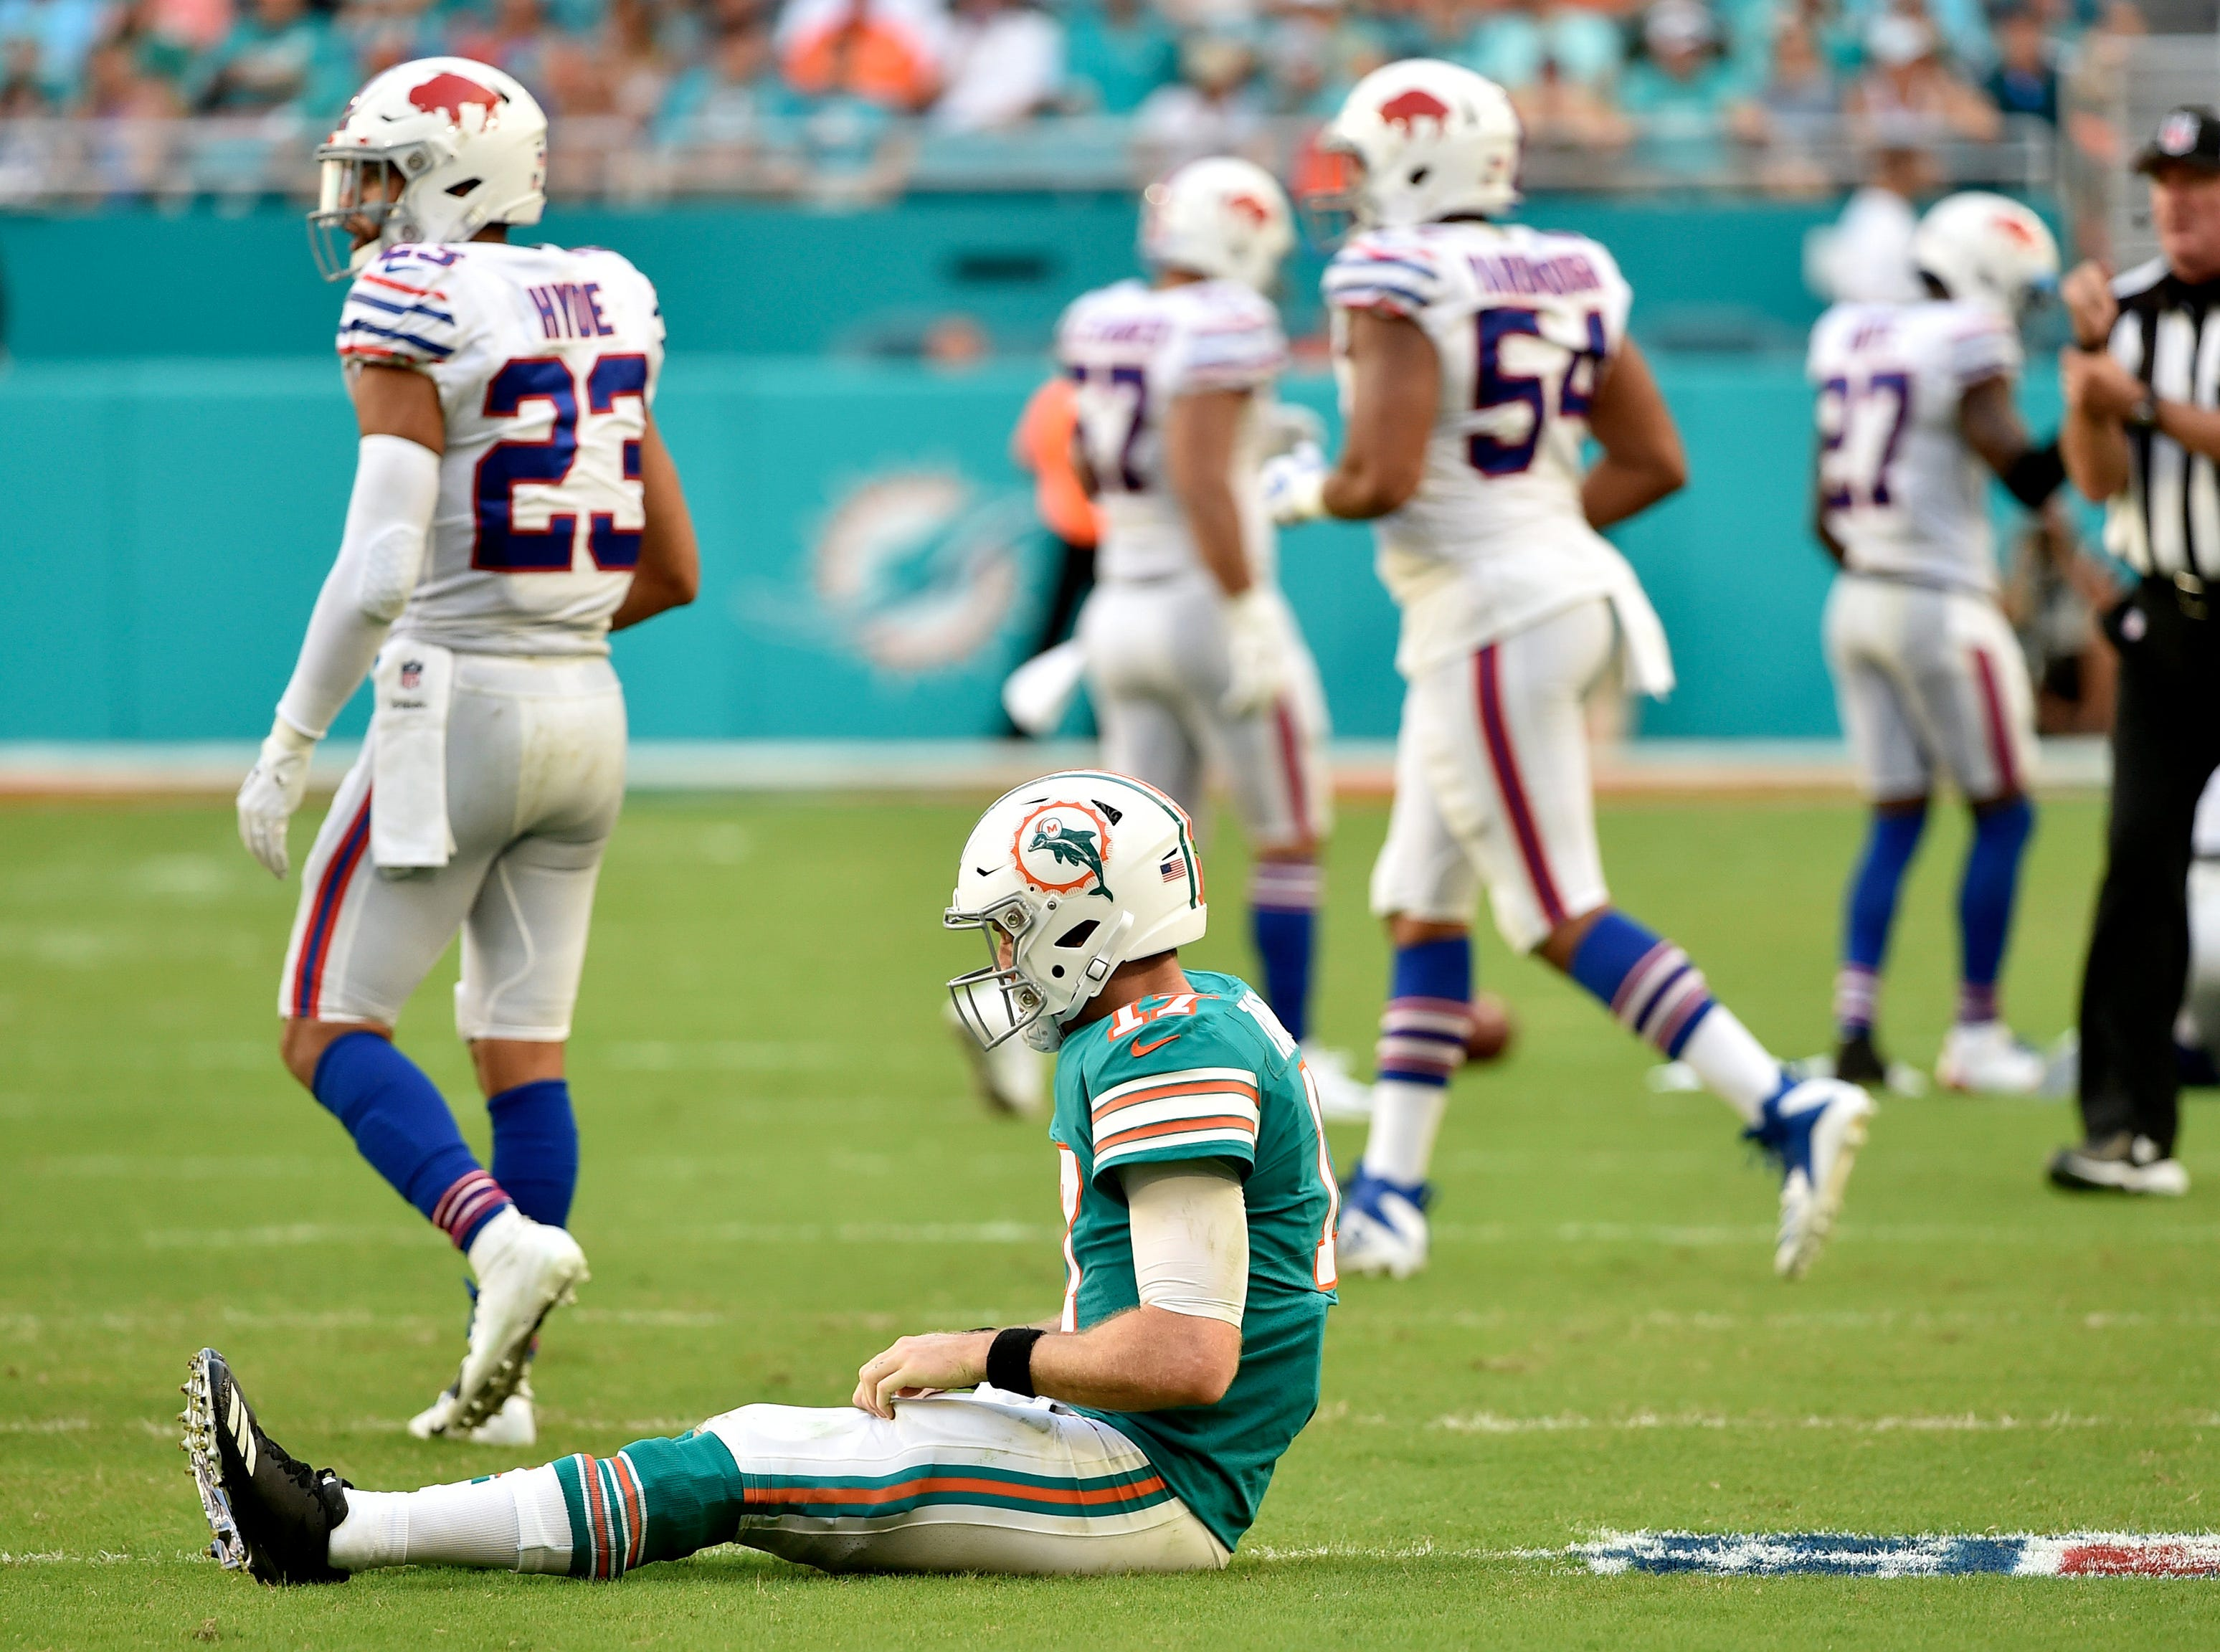 Dec 2, 2018; Miami Gardens, FL, USA; Miami Dolphins quarterback Ryan Tannehill (17) reacts against the Buffalo Bills during the second half at Hard Rock Stadium. Mandatory Credit: Steve Mitchell-USA TODAY Sports